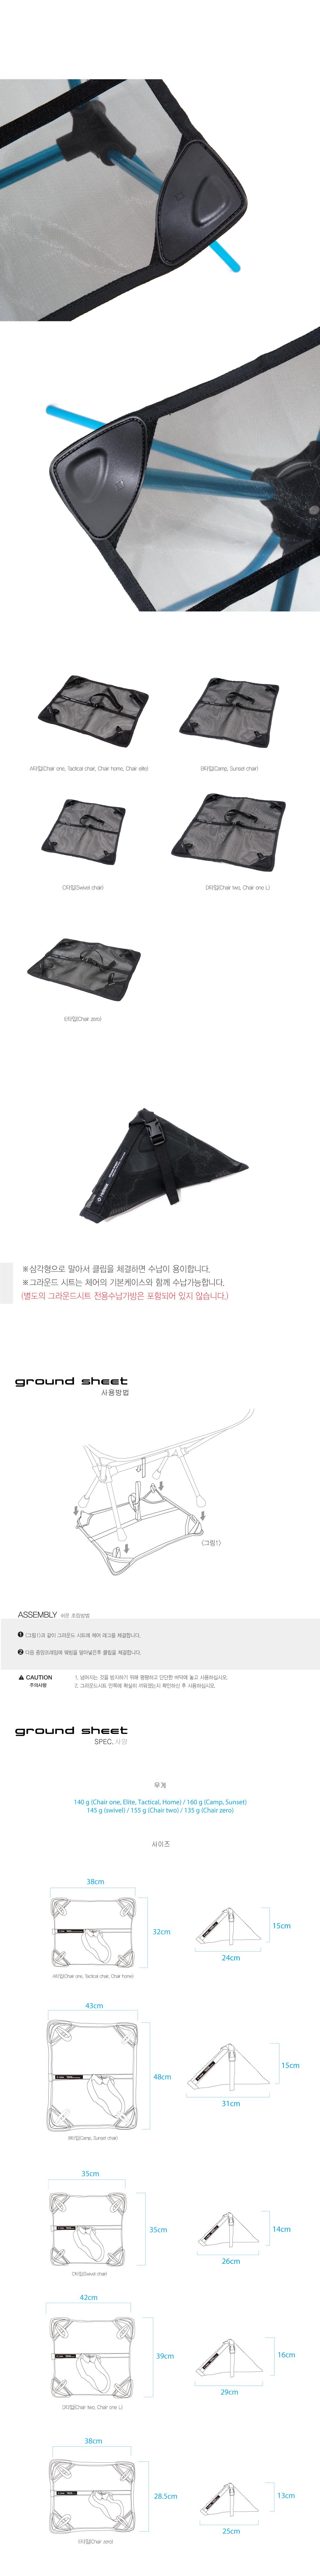 20180305-Helinox_Ground-Sheet_상품페이지-2.jpg